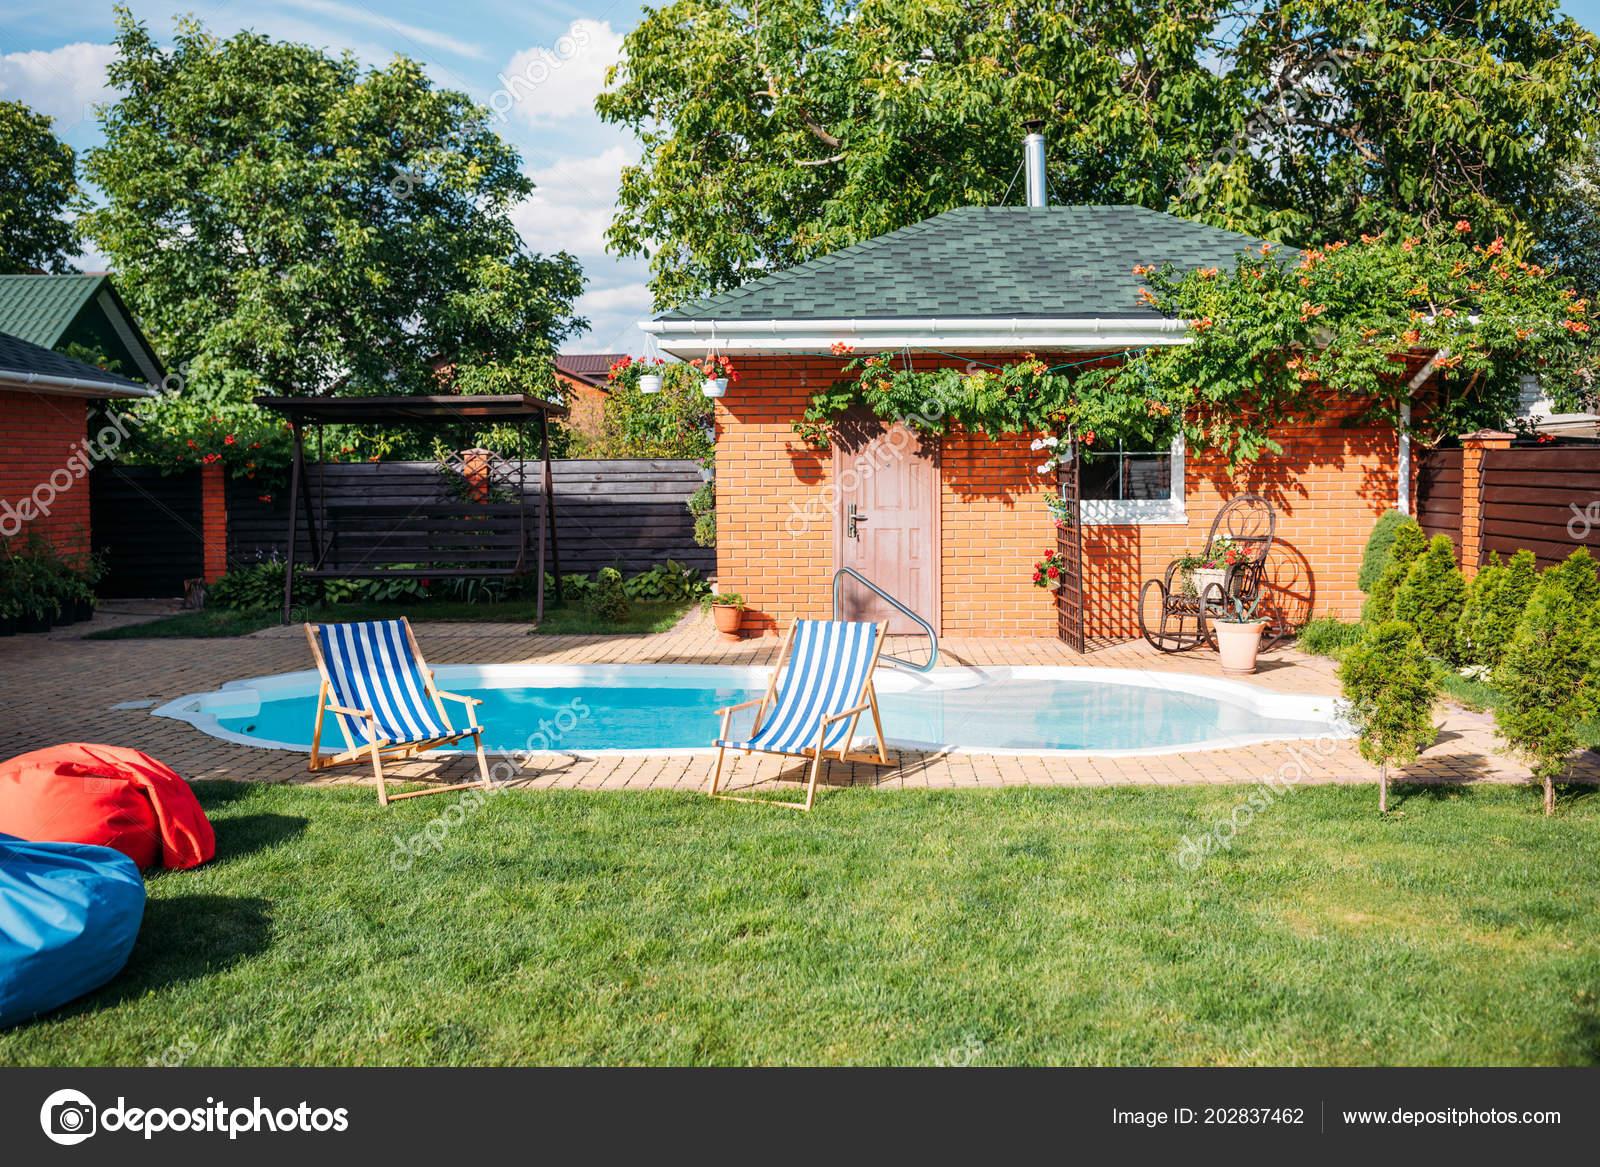 Casa campo con c sped piscina hamacas patio foto de for Fotos casas de campo con piscina